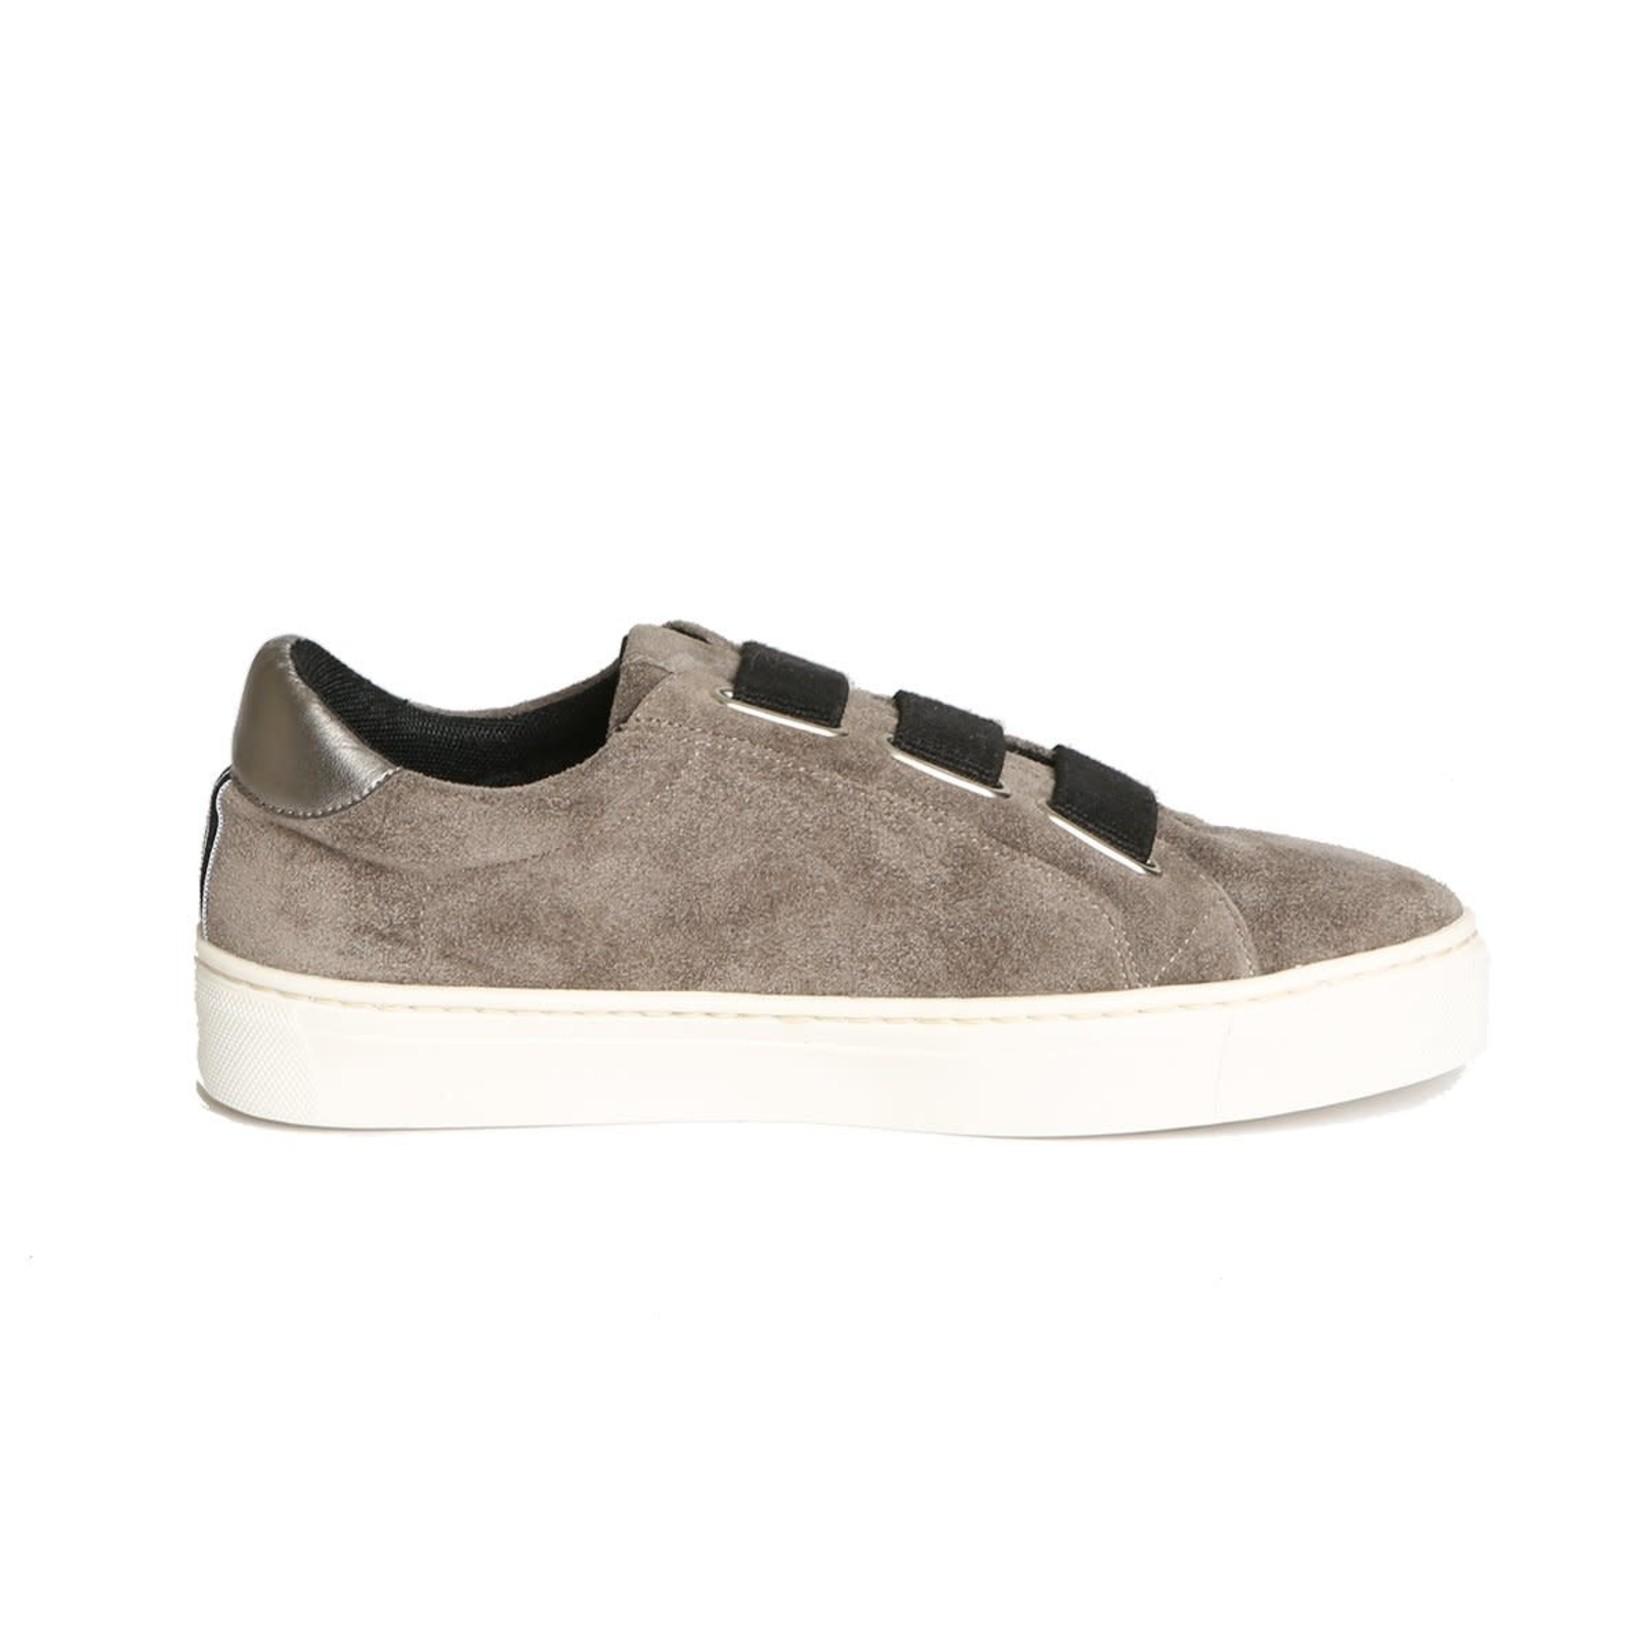 The Flexx Sneak Easy Suede/Calf Sneaker